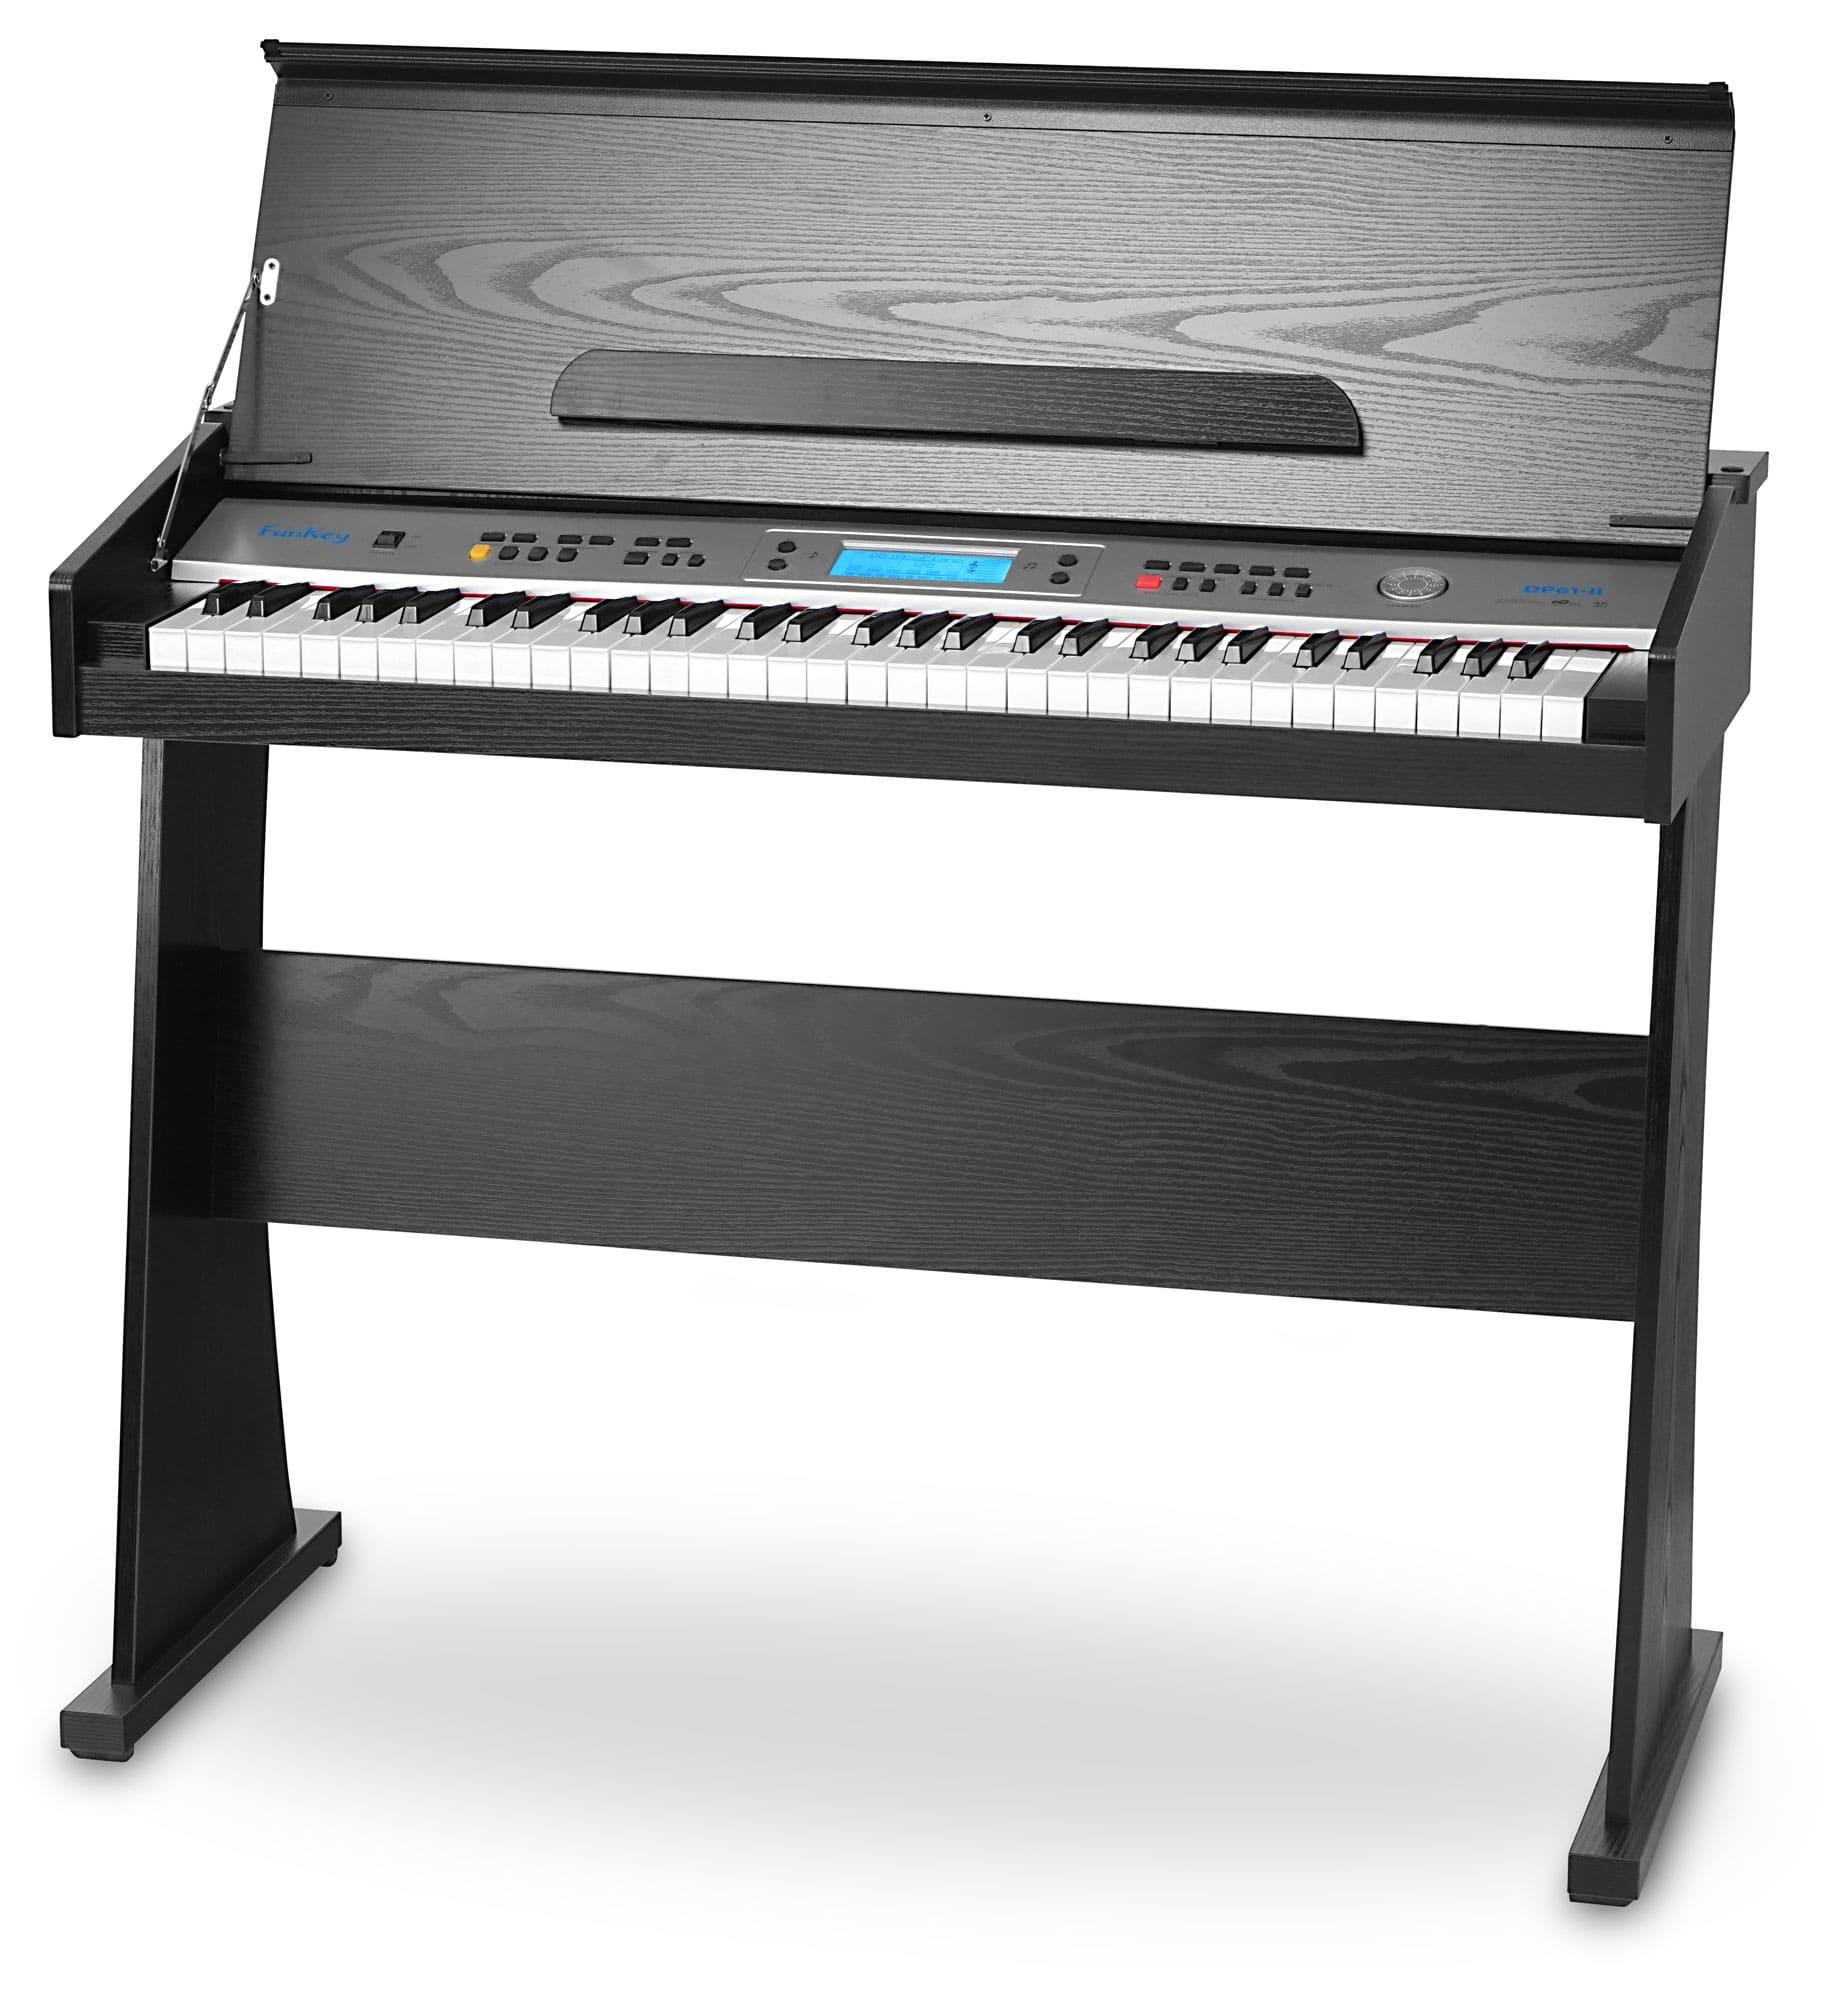 FunKey DP 61 II Keyboard mit 61 Tasten im Digitalpiano Design, schwarz